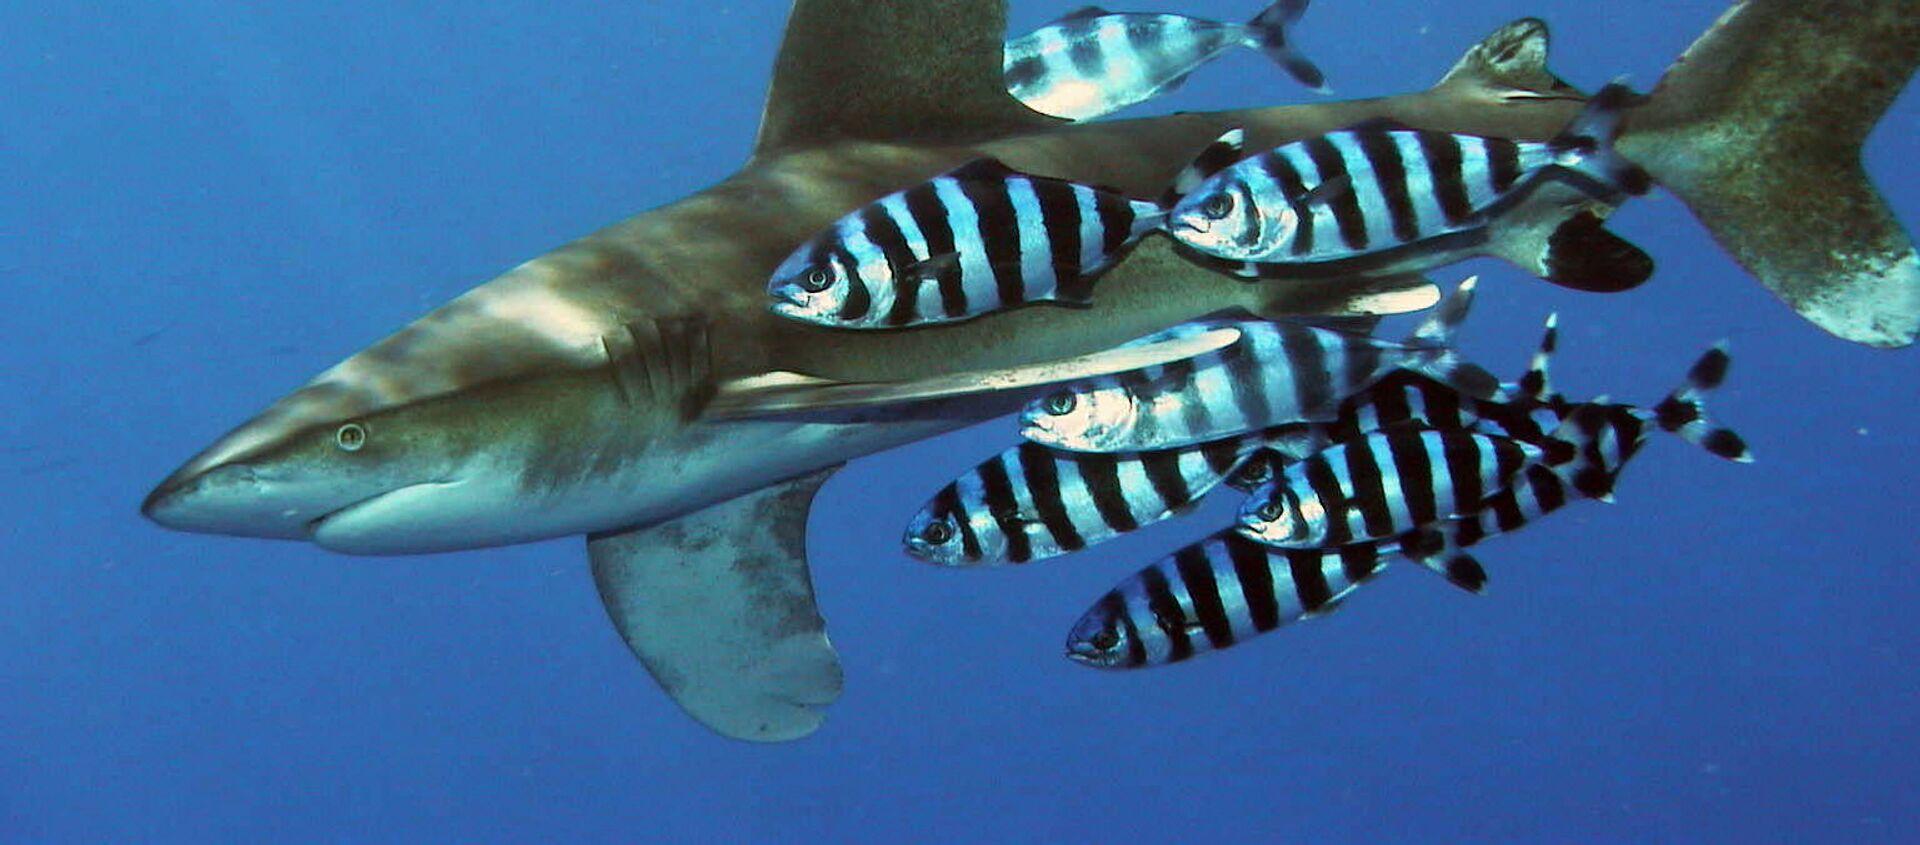 Tiburón oceánico de puntas blancas (Carcharhinus longimanus) - Sputnik Mundo, 1920, 04.08.2020